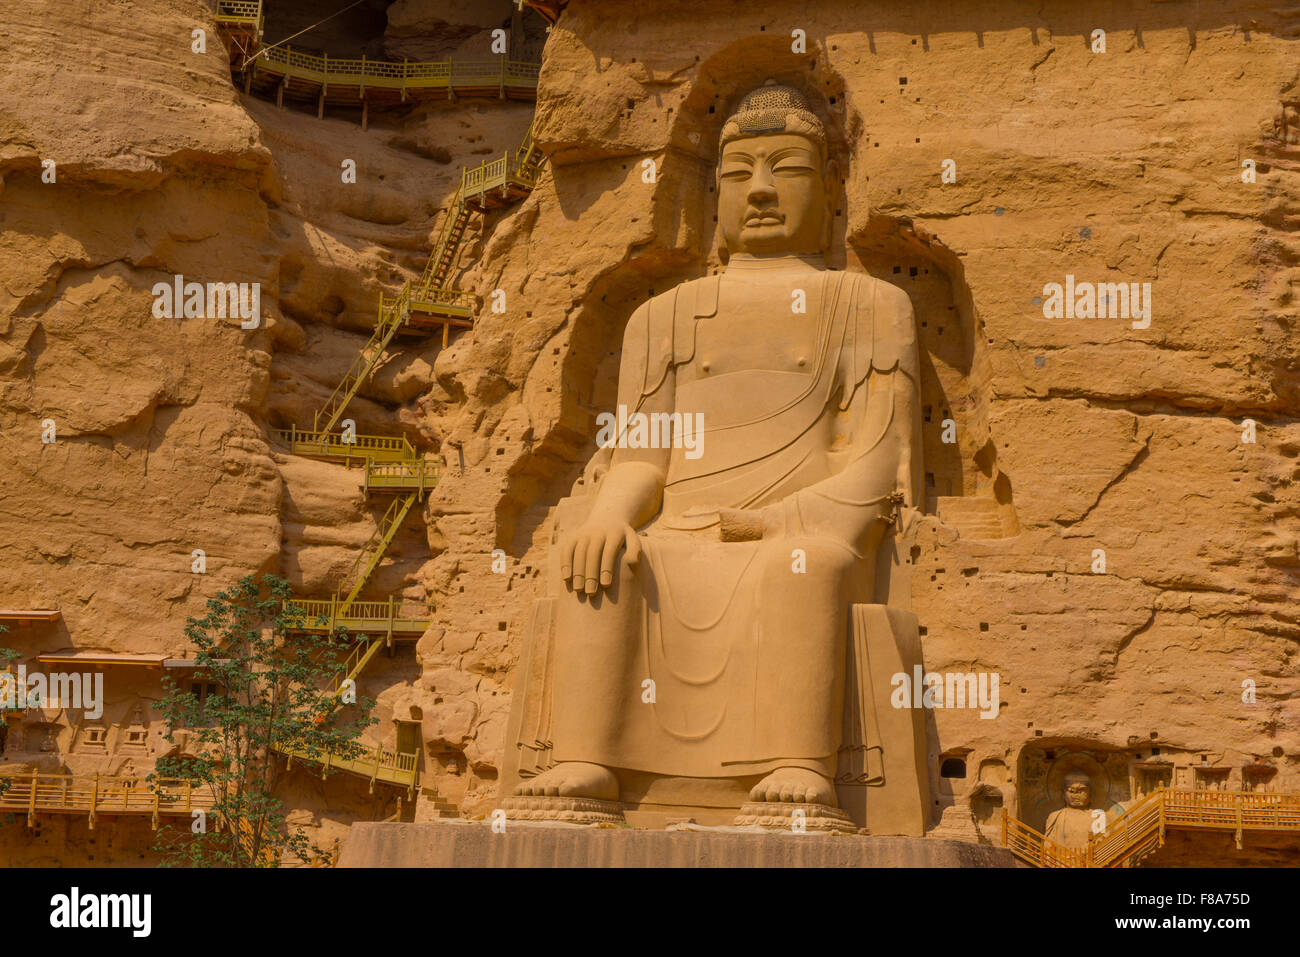 Enorme statua di Buddha, Bing Ling Grotta e Tempio Ganshu Provincia, Cina Fiume Giallo Immagini Stock